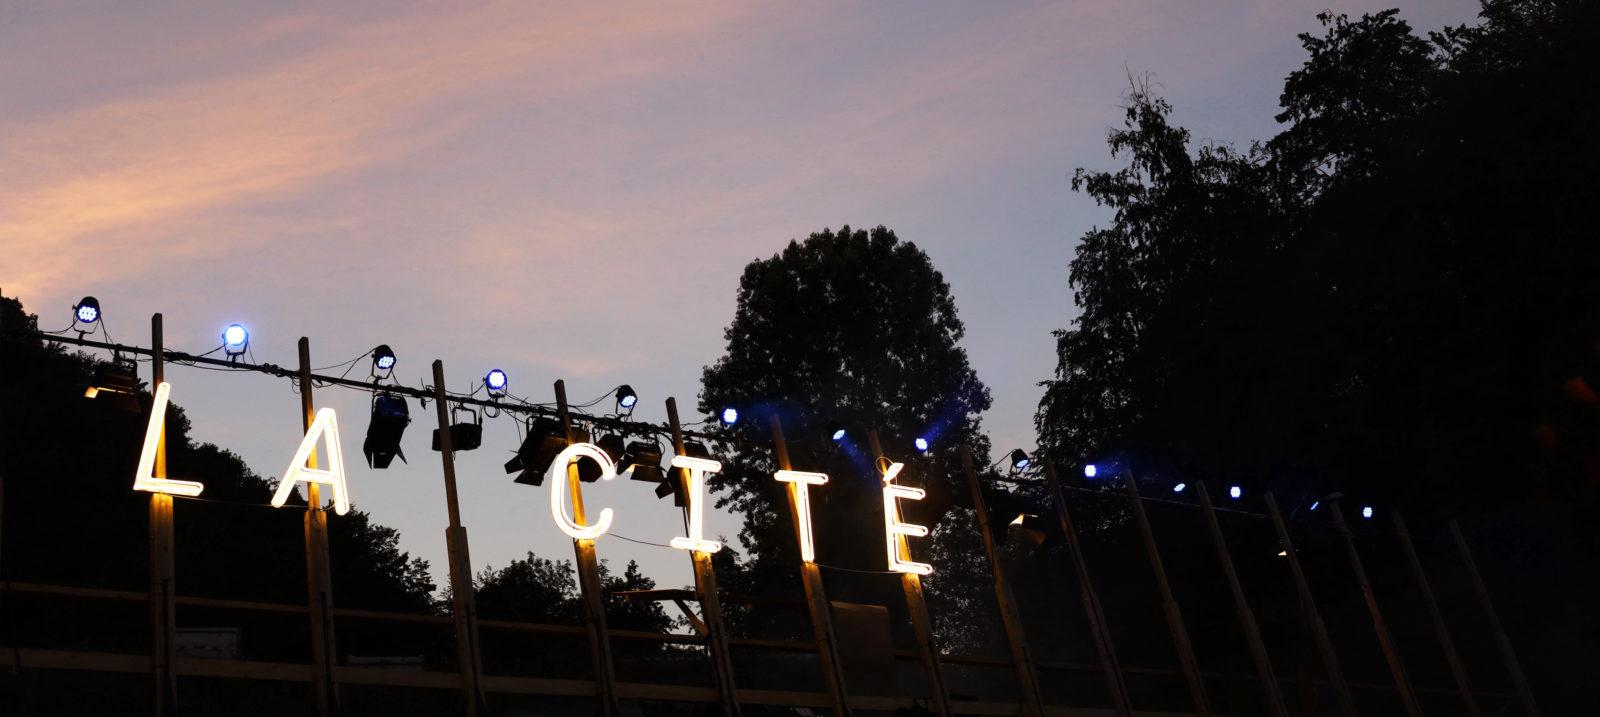 lausanne 2021 Festival © Noemi Cinelli